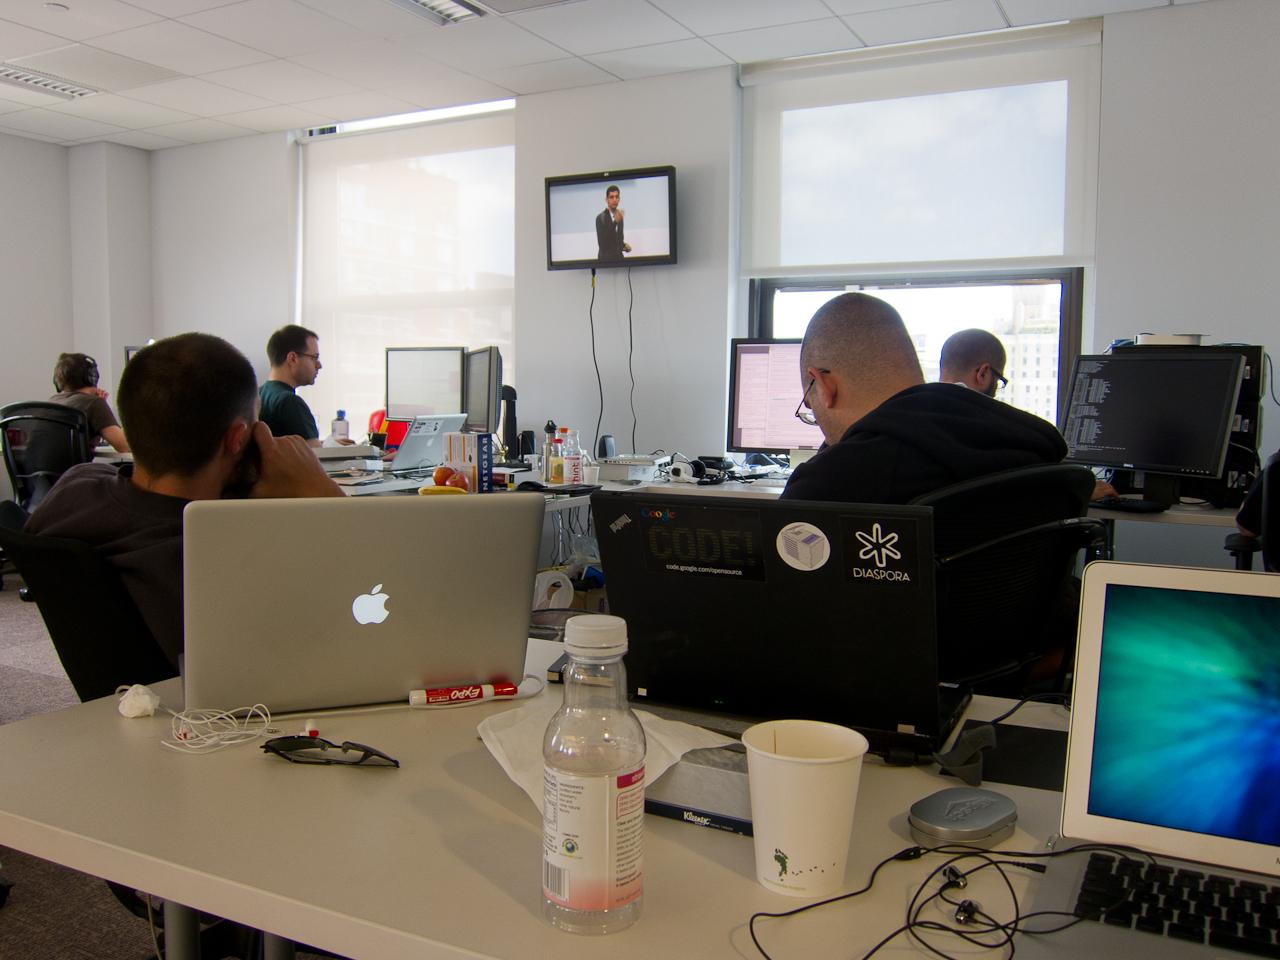 Photo: Taking a break to watch a Google IO Keynote.